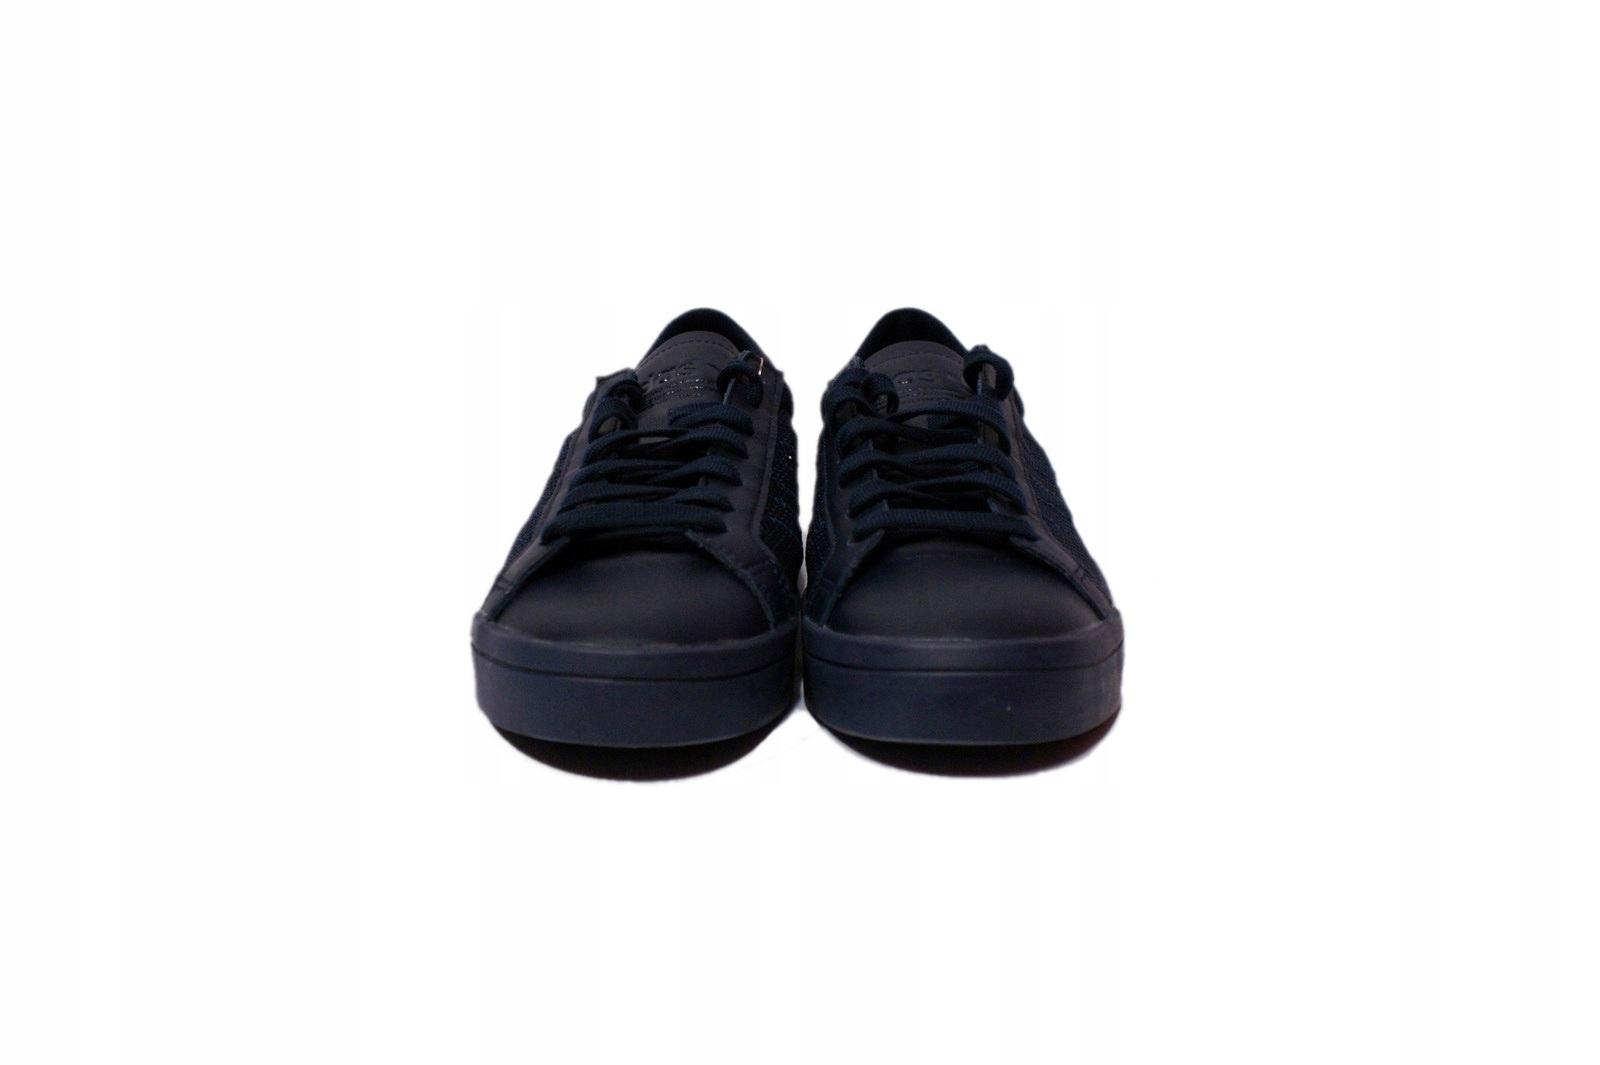 save off 922d1 858b2 Buty Adidas CourtVantage 40 23 Smith (7230460975)